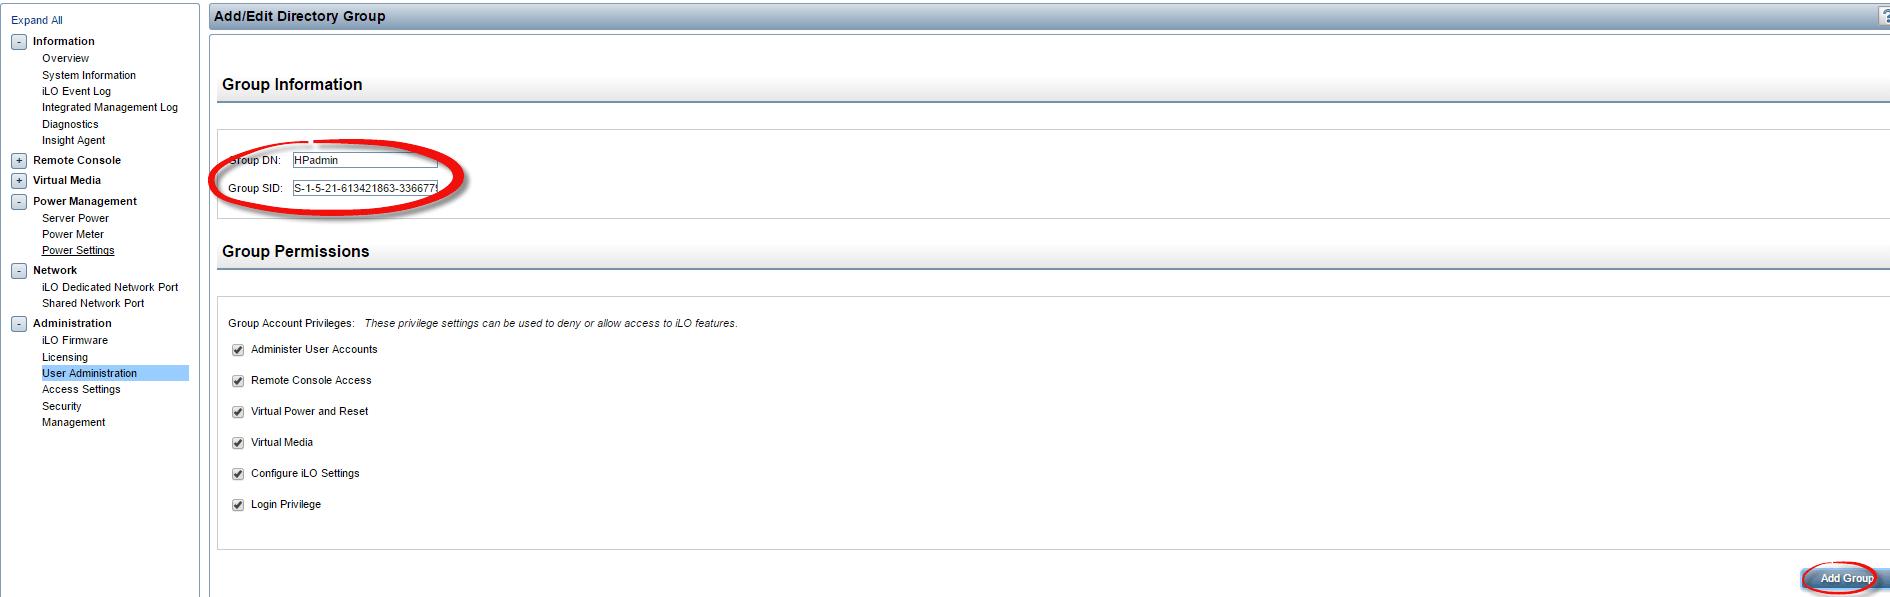 Как настроить аутентификацию Active Directory на HP iLO 3 через WEB интерфейс ILO-02